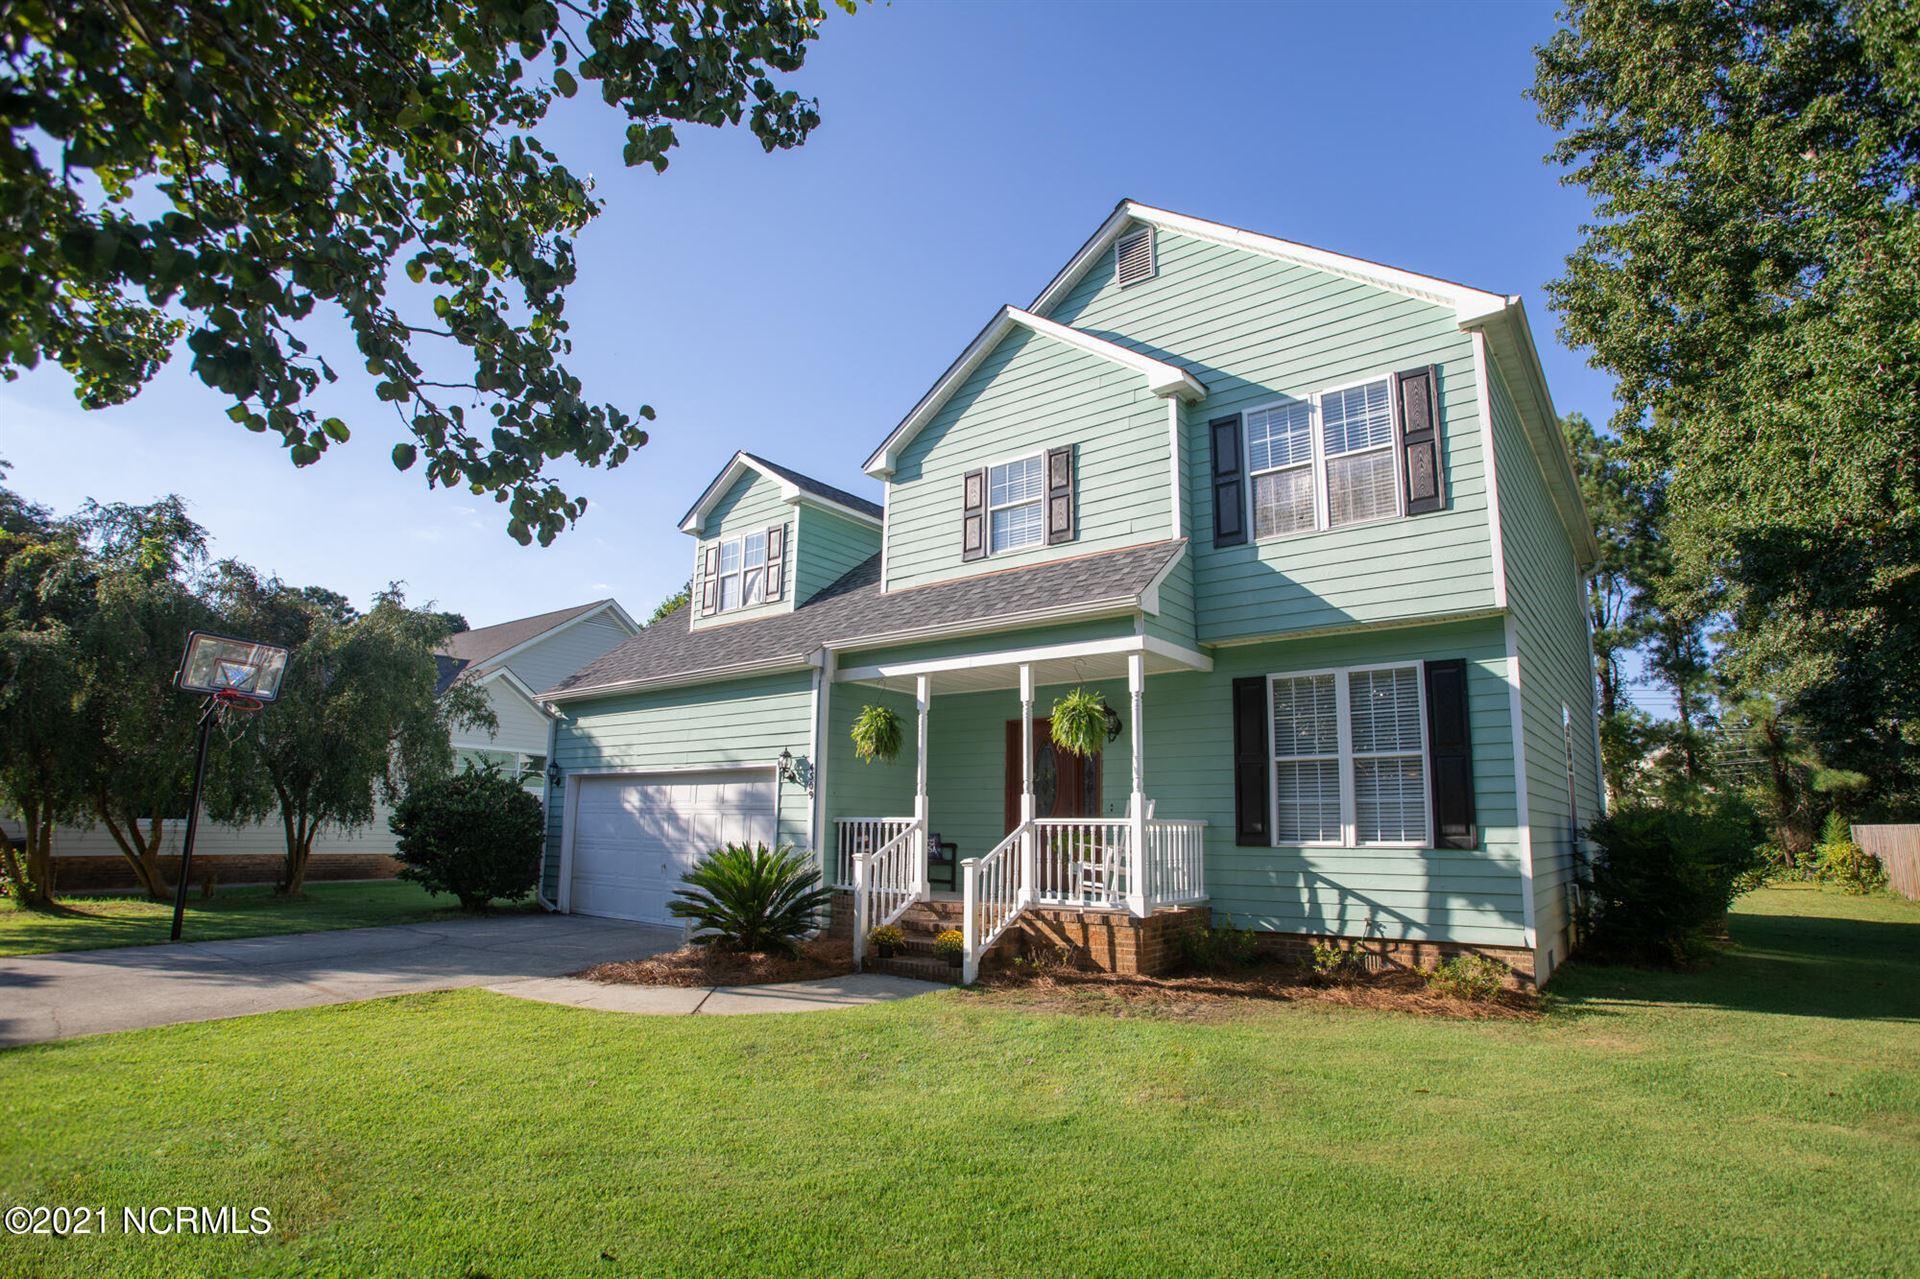 Photo of 4509 Pine Hollow Drive, Wilmington, NC 28412 (MLS # 100288372)